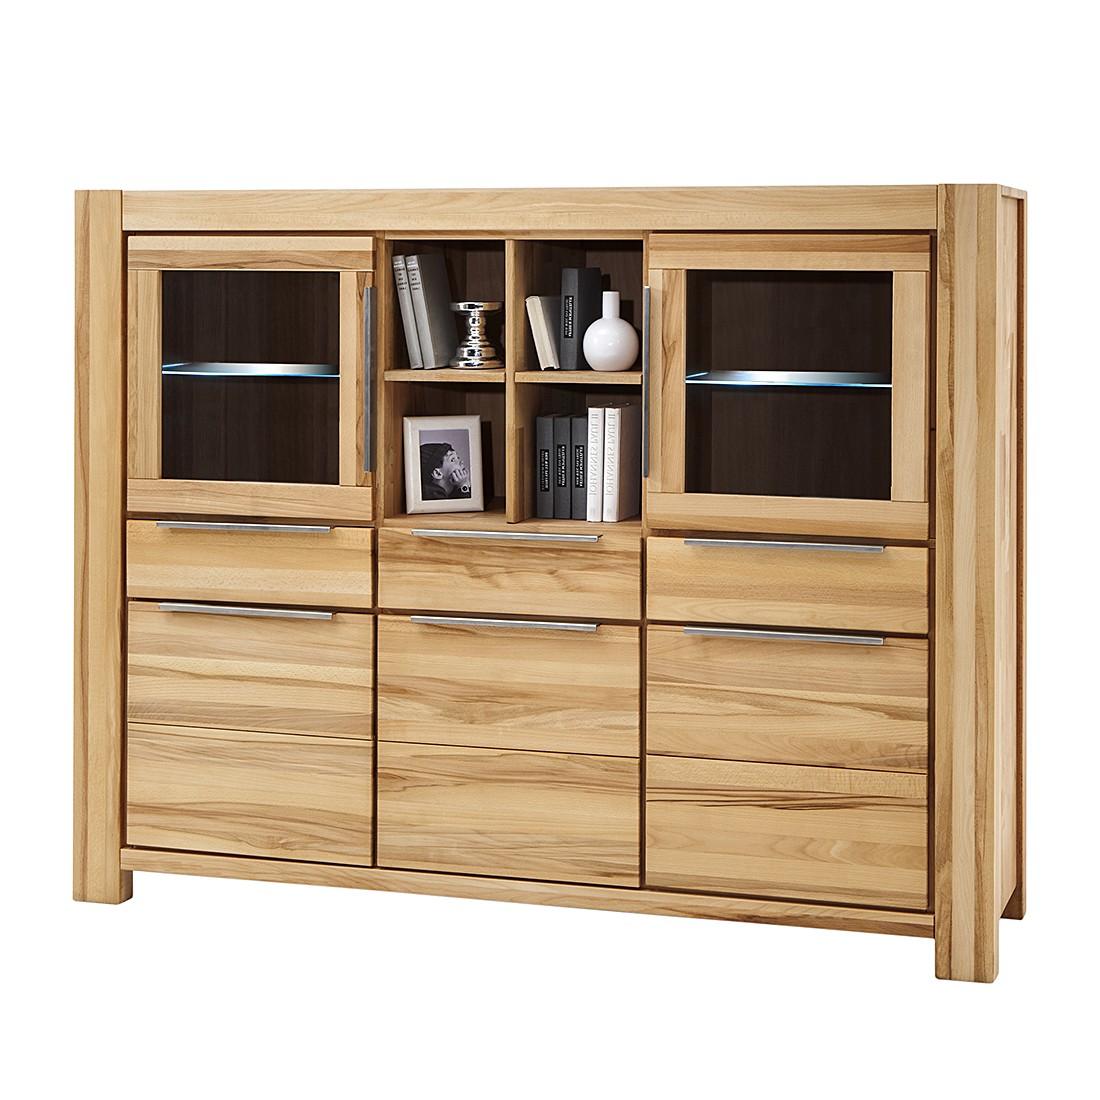 highboard kernbuche ge lt preis vergleich 2016. Black Bedroom Furniture Sets. Home Design Ideas